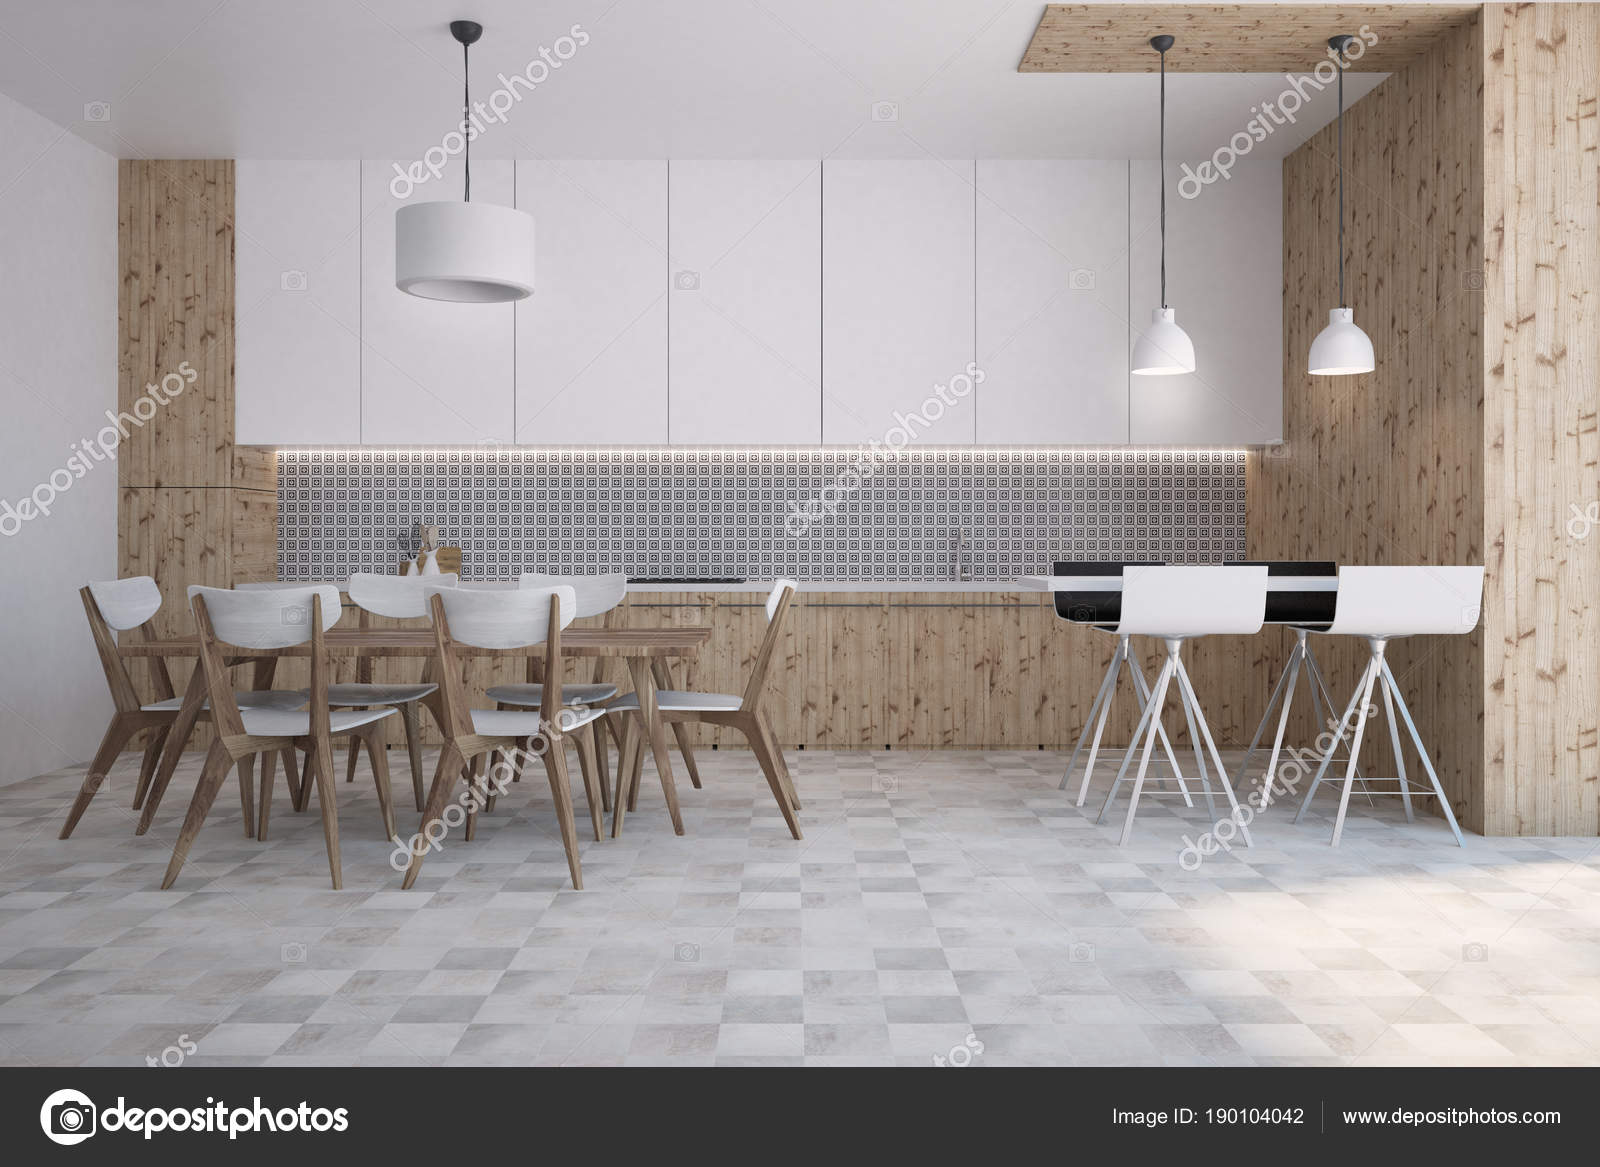 Keuken Bar Muur : Grijze muur patroon keuken en eetkamer bar u stockfoto